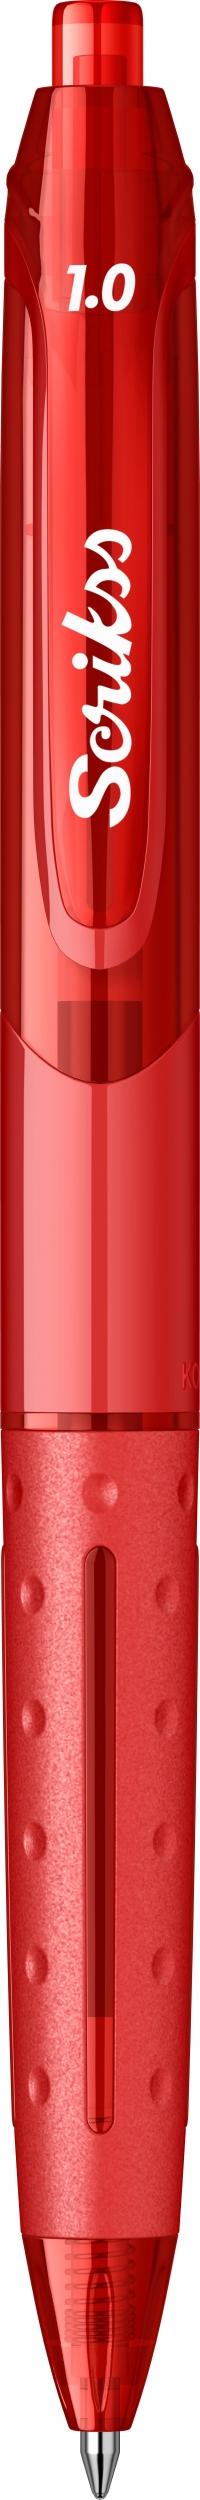 Гел химикалка Scrikss 1.0, модел 53406, Хубрид Червено